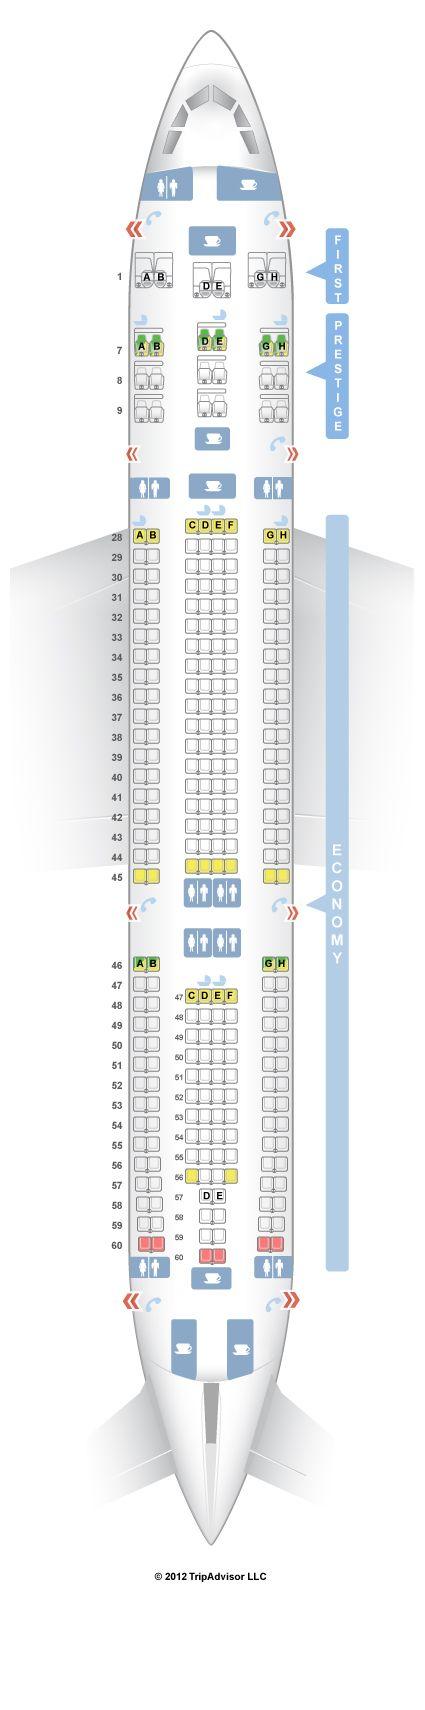 SeatGuru Seat Map Korean Air Airbus A330-300 (333) - SeatGuru